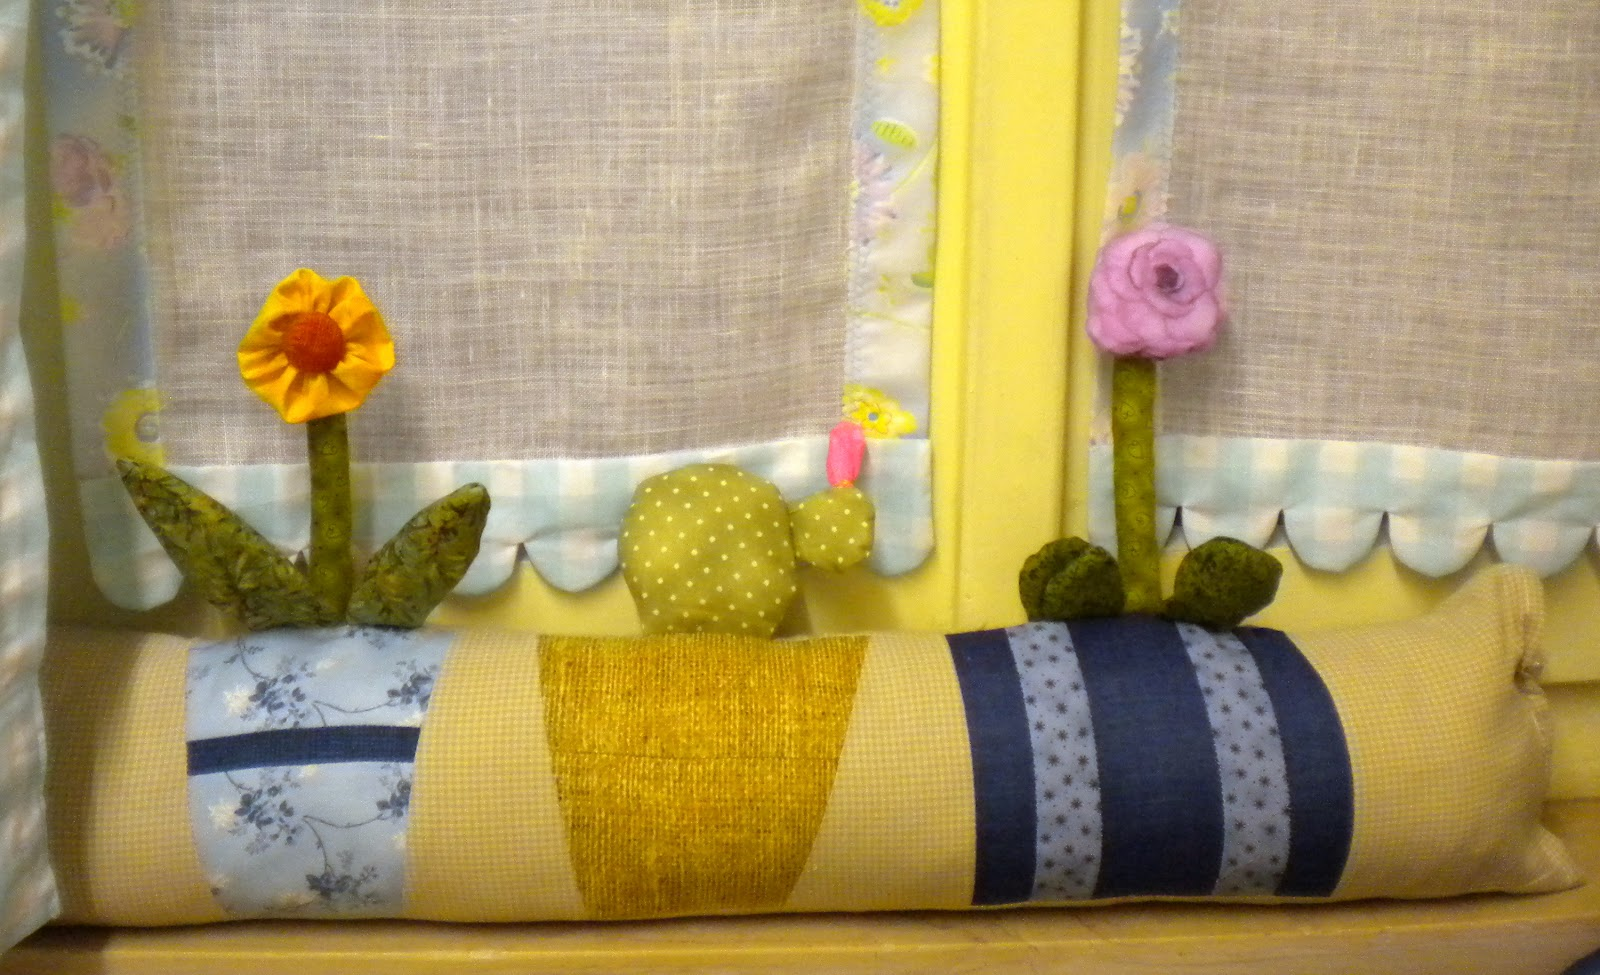 Il patchwork veste casa paraspifferi - Paraspifferi per finestre ...